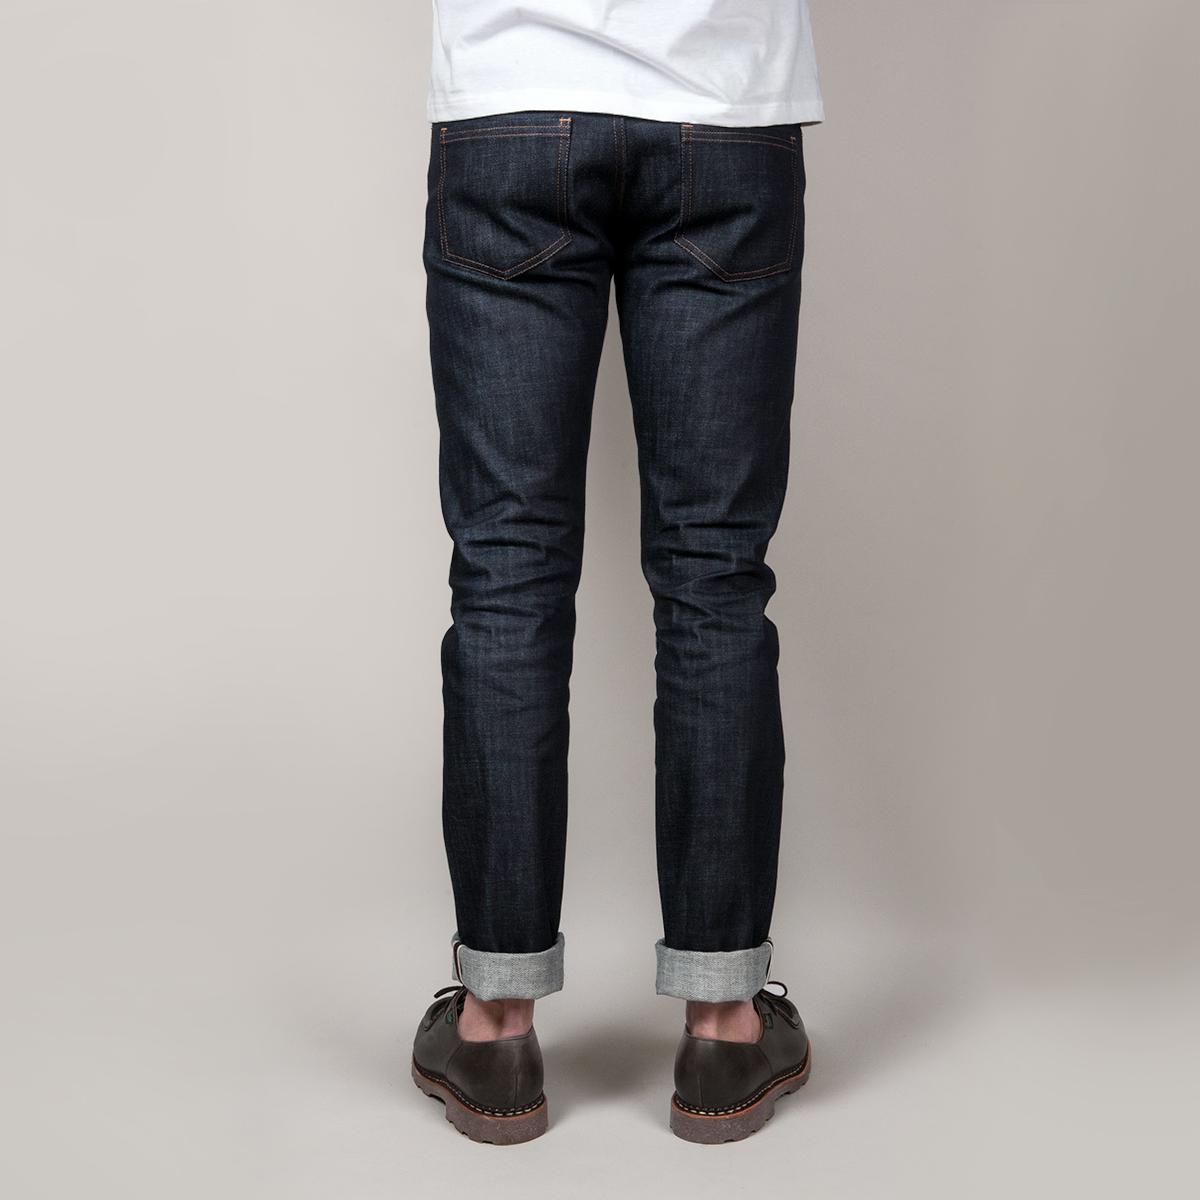 Jeans madeinfrance selvedge back